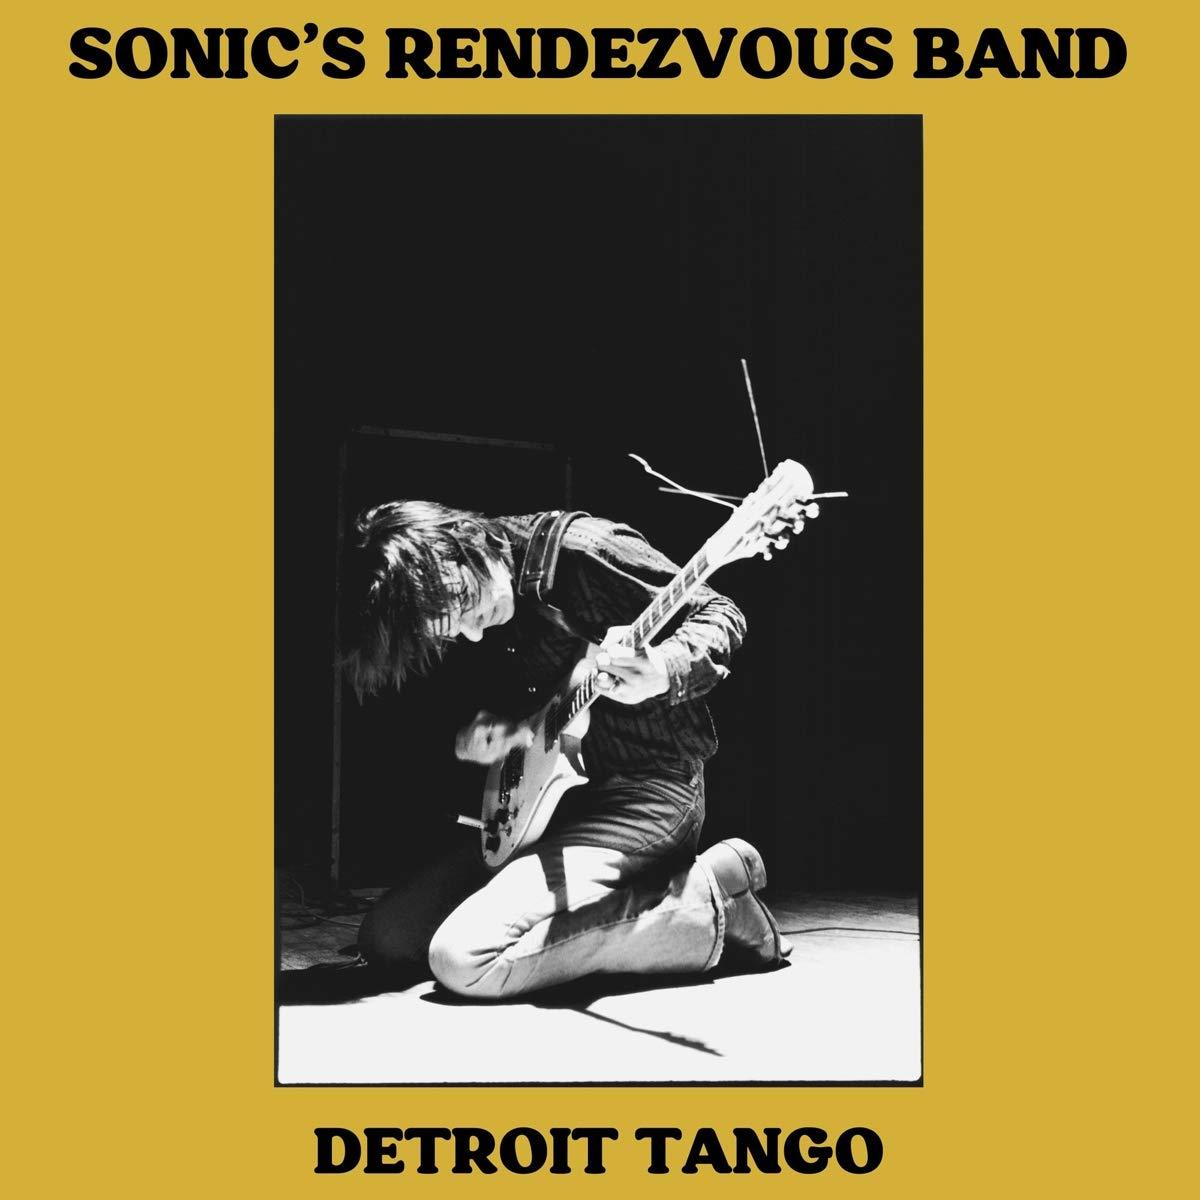 Sonic's Rendezvous Band - Detroit Tango [2xLP]